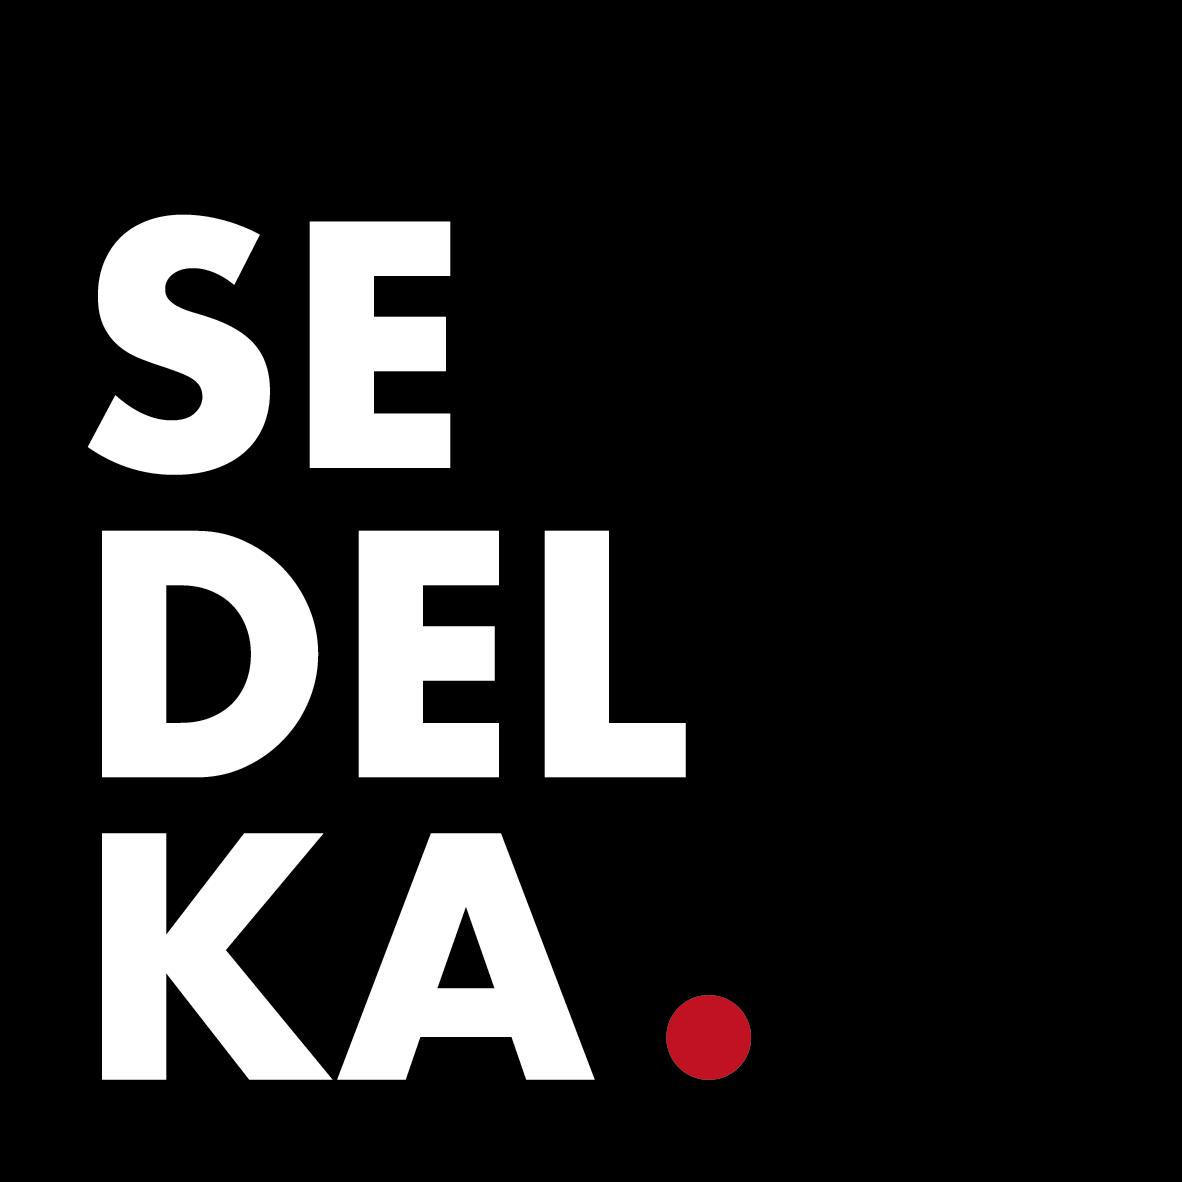 Immobilier neuf Sedelka